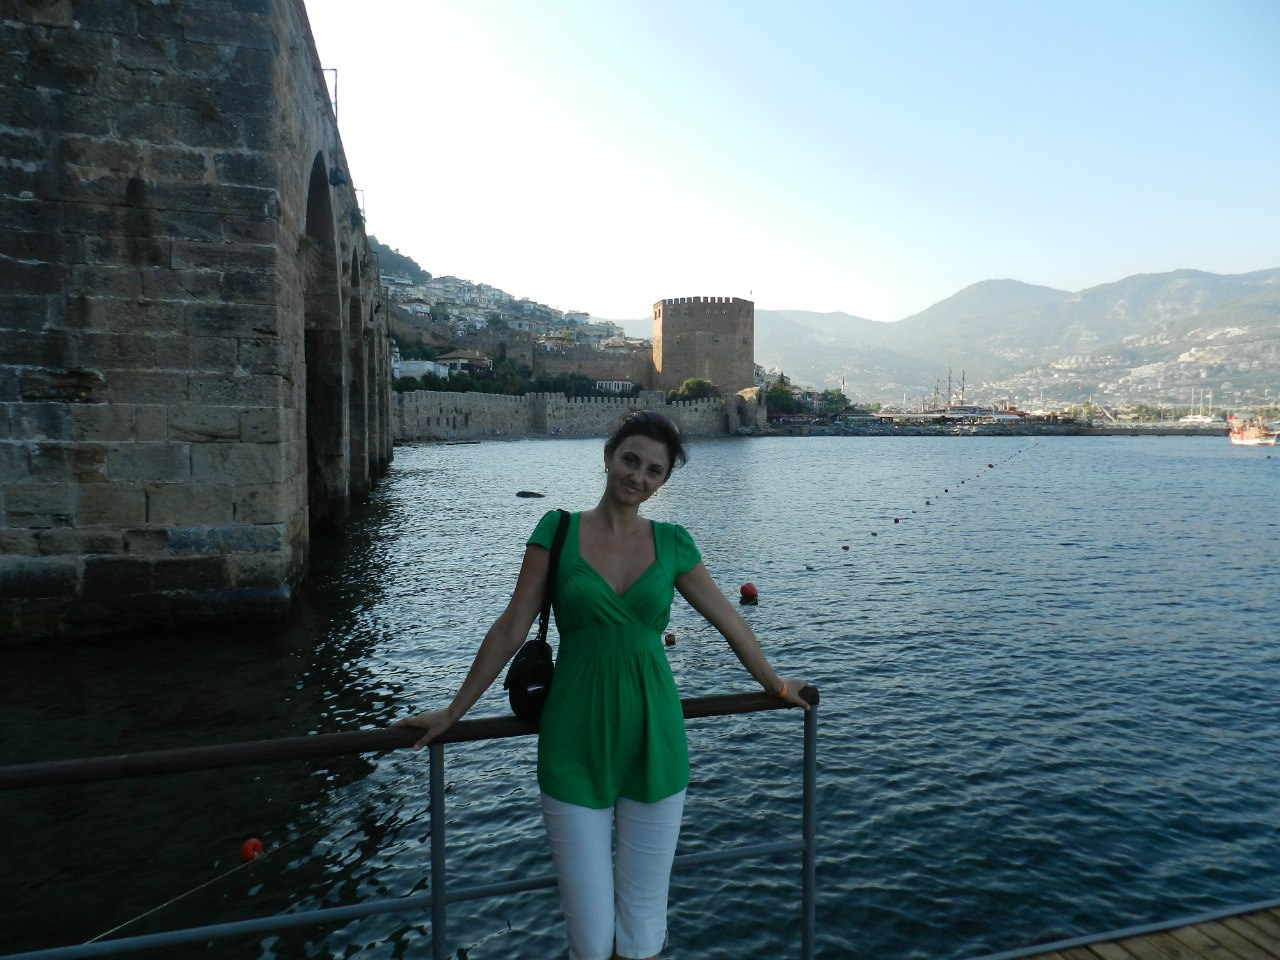 photo from album of Svetlana Gileva №7